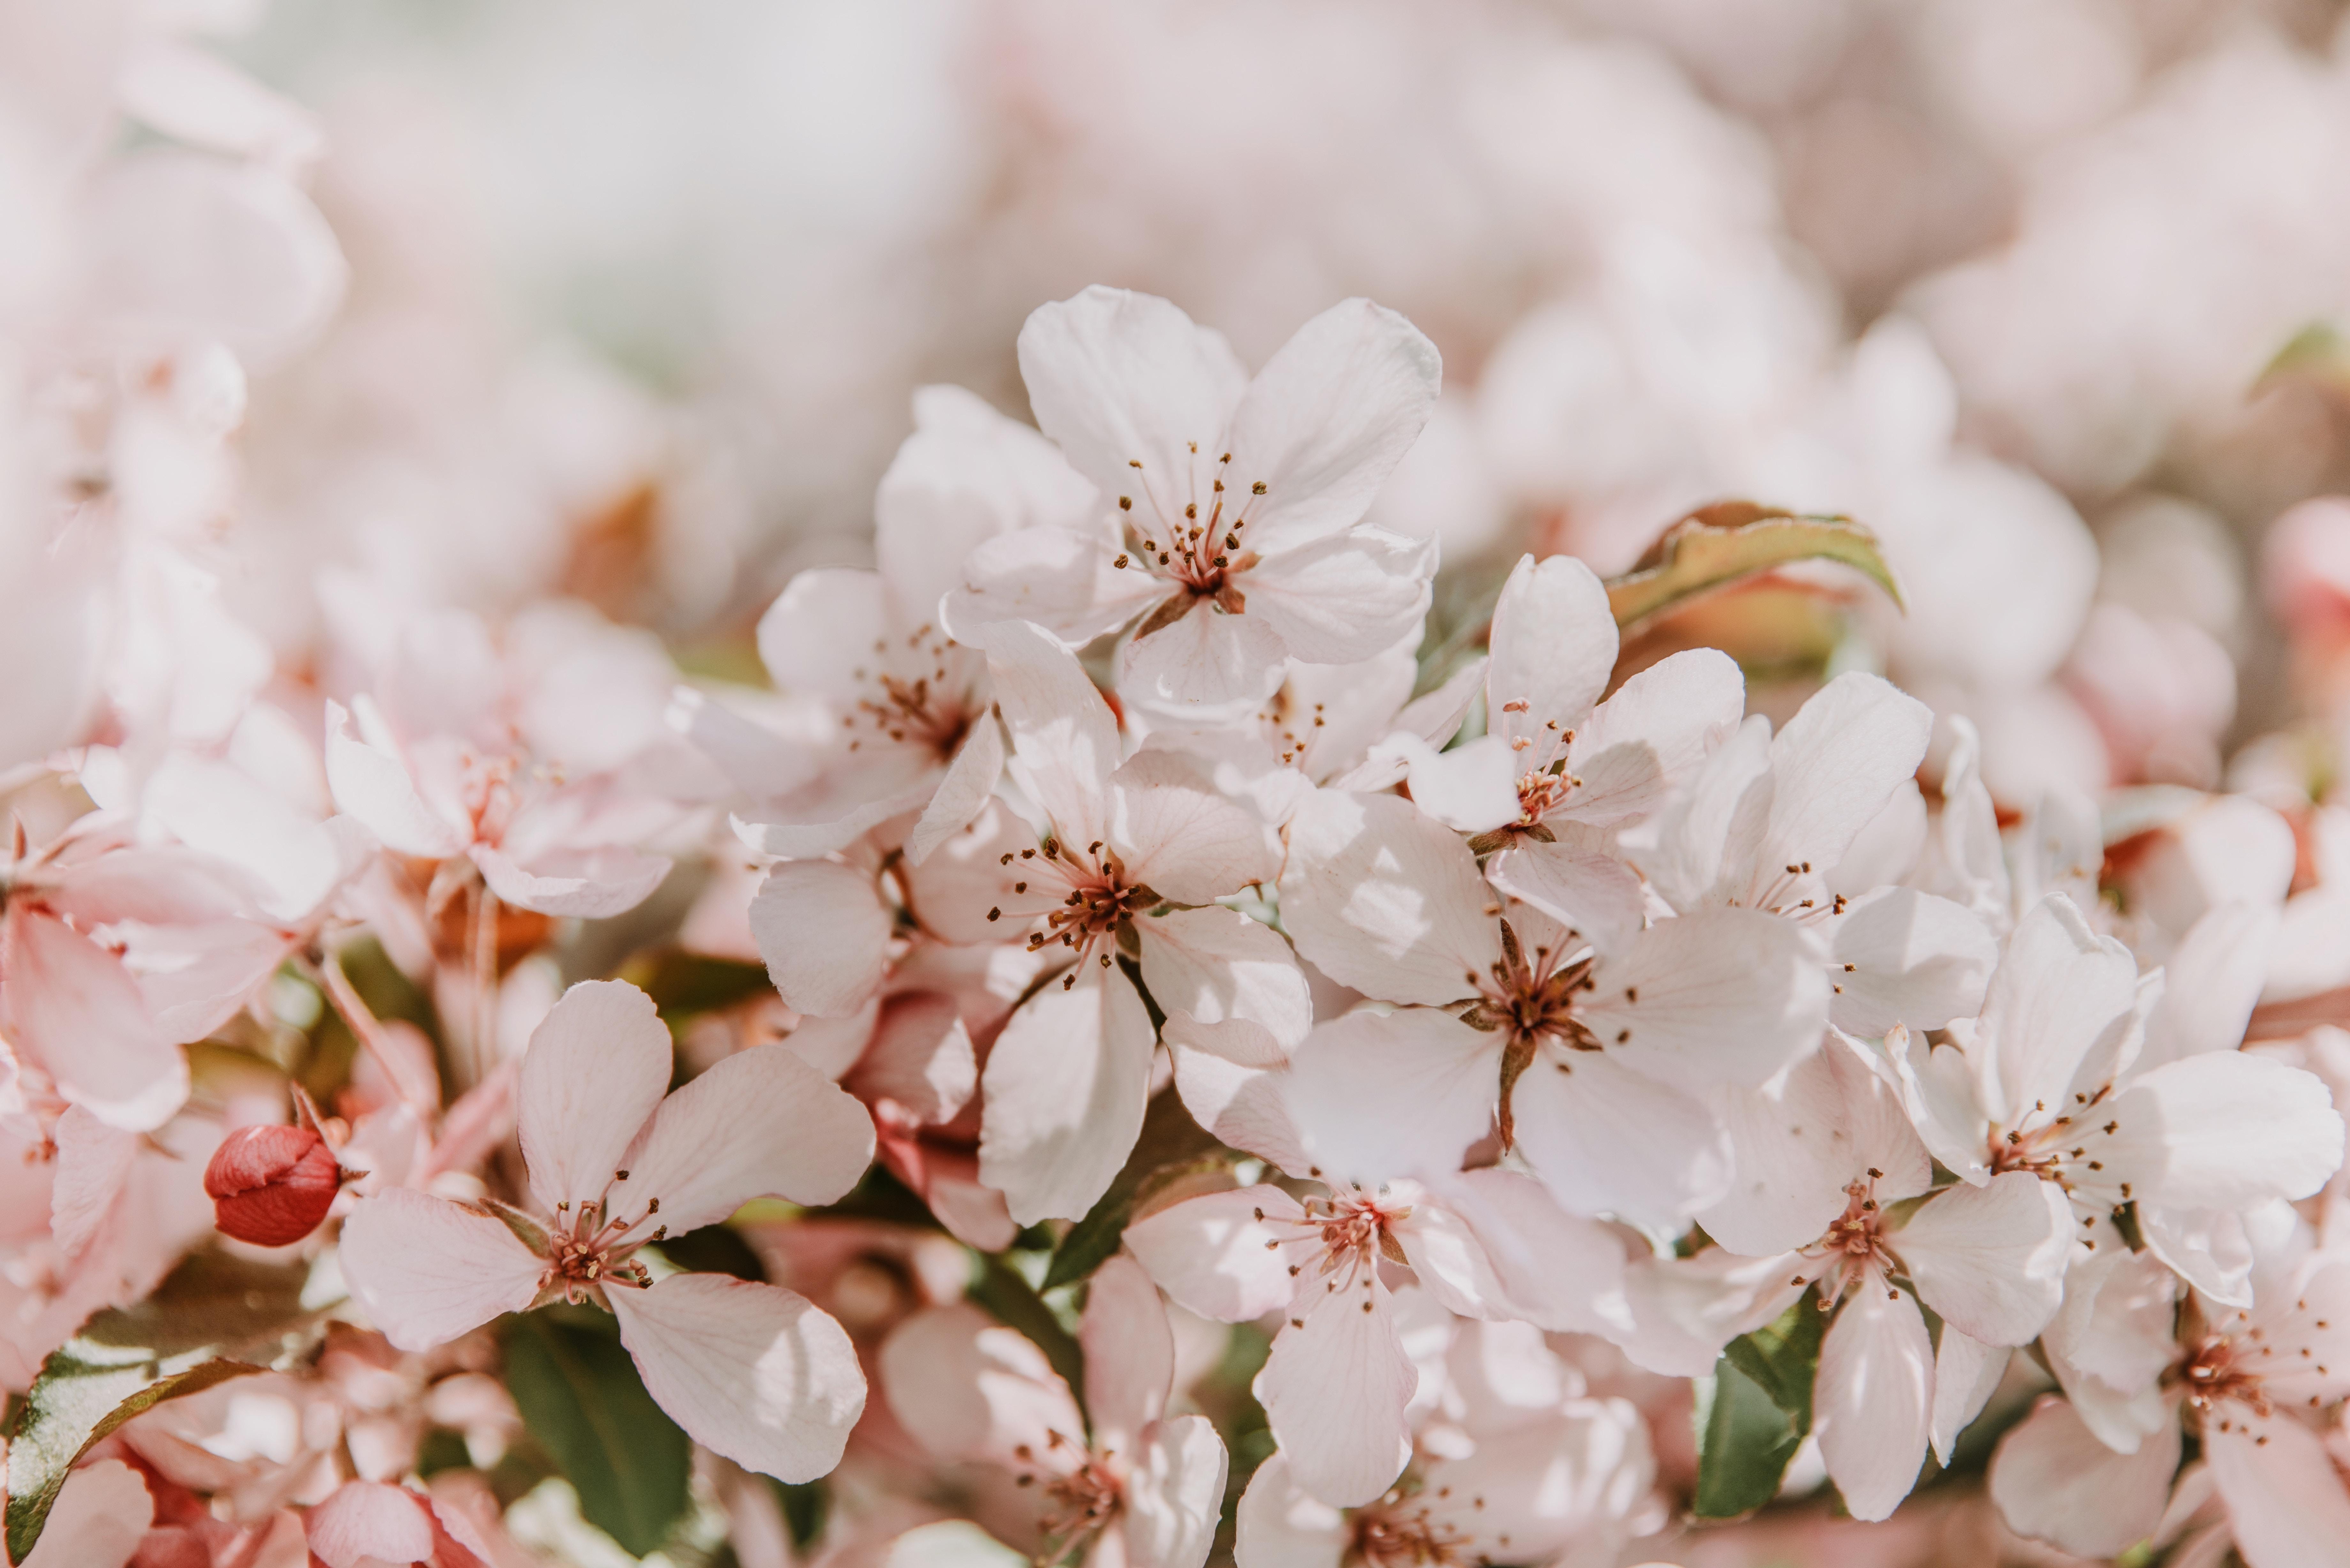 55497 Screensavers and Wallpapers Sakura for phone. Download Flowers, Sakura, Tender, Spring, Blooms, Light Pink pictures for free